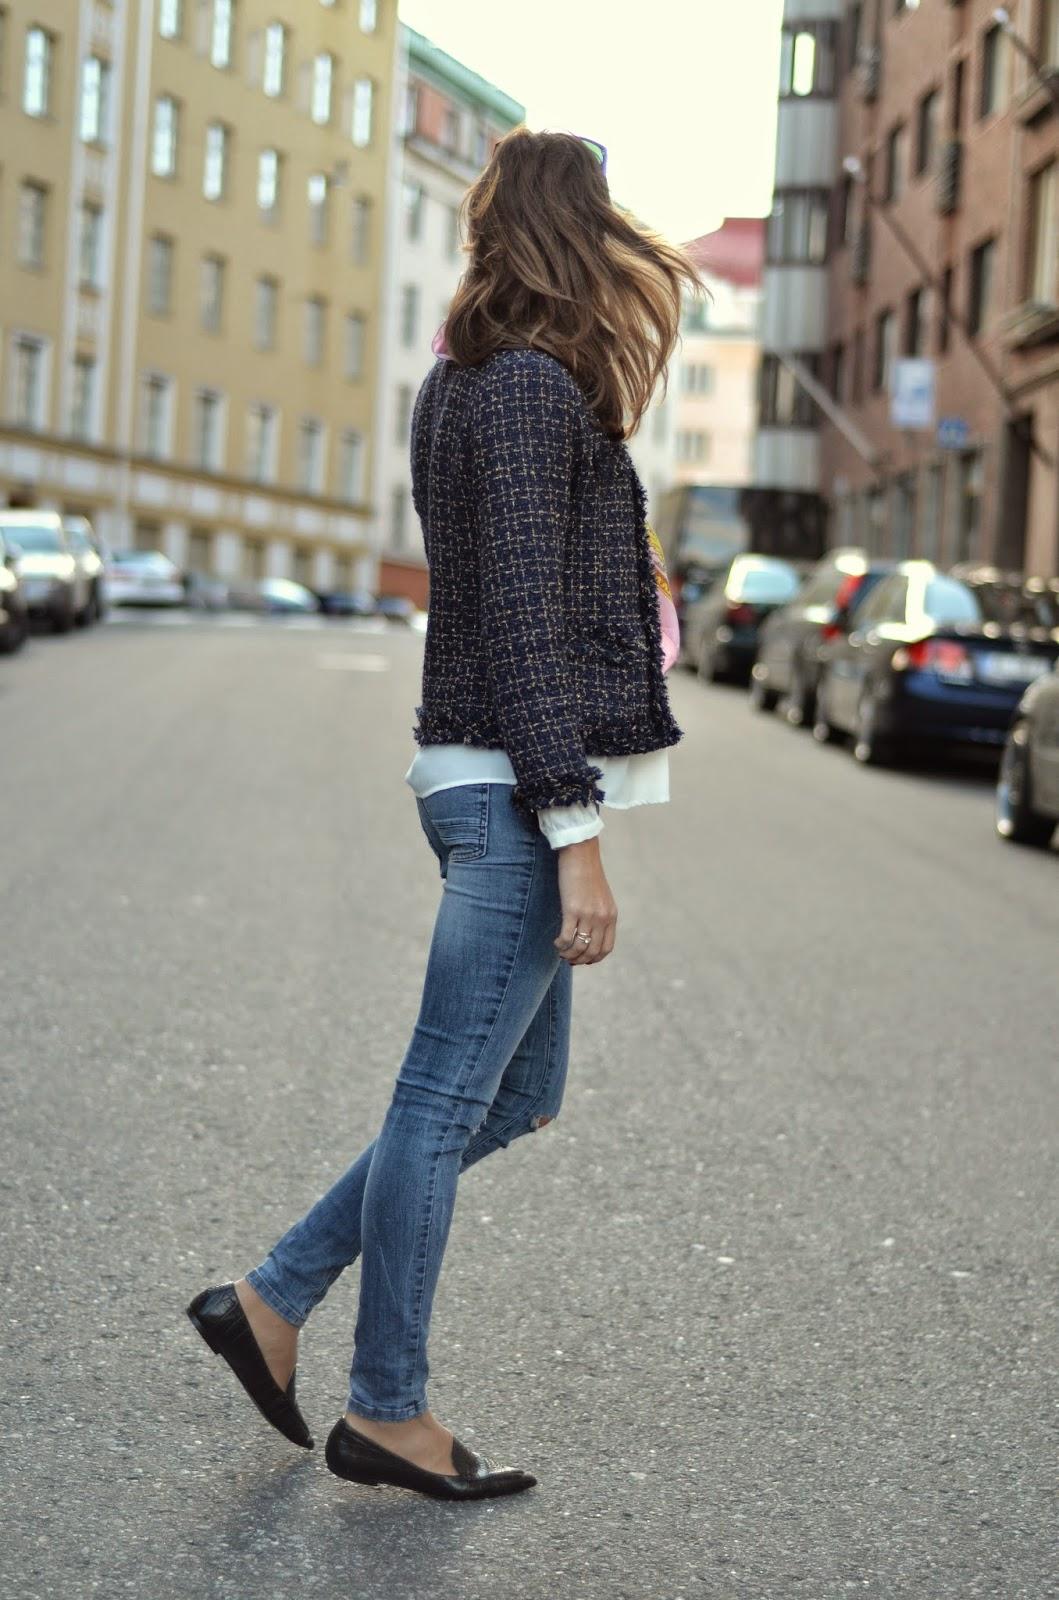 blue-sheinside-tweed-jacket-zara-jeans-mango-croc-pointed-flats